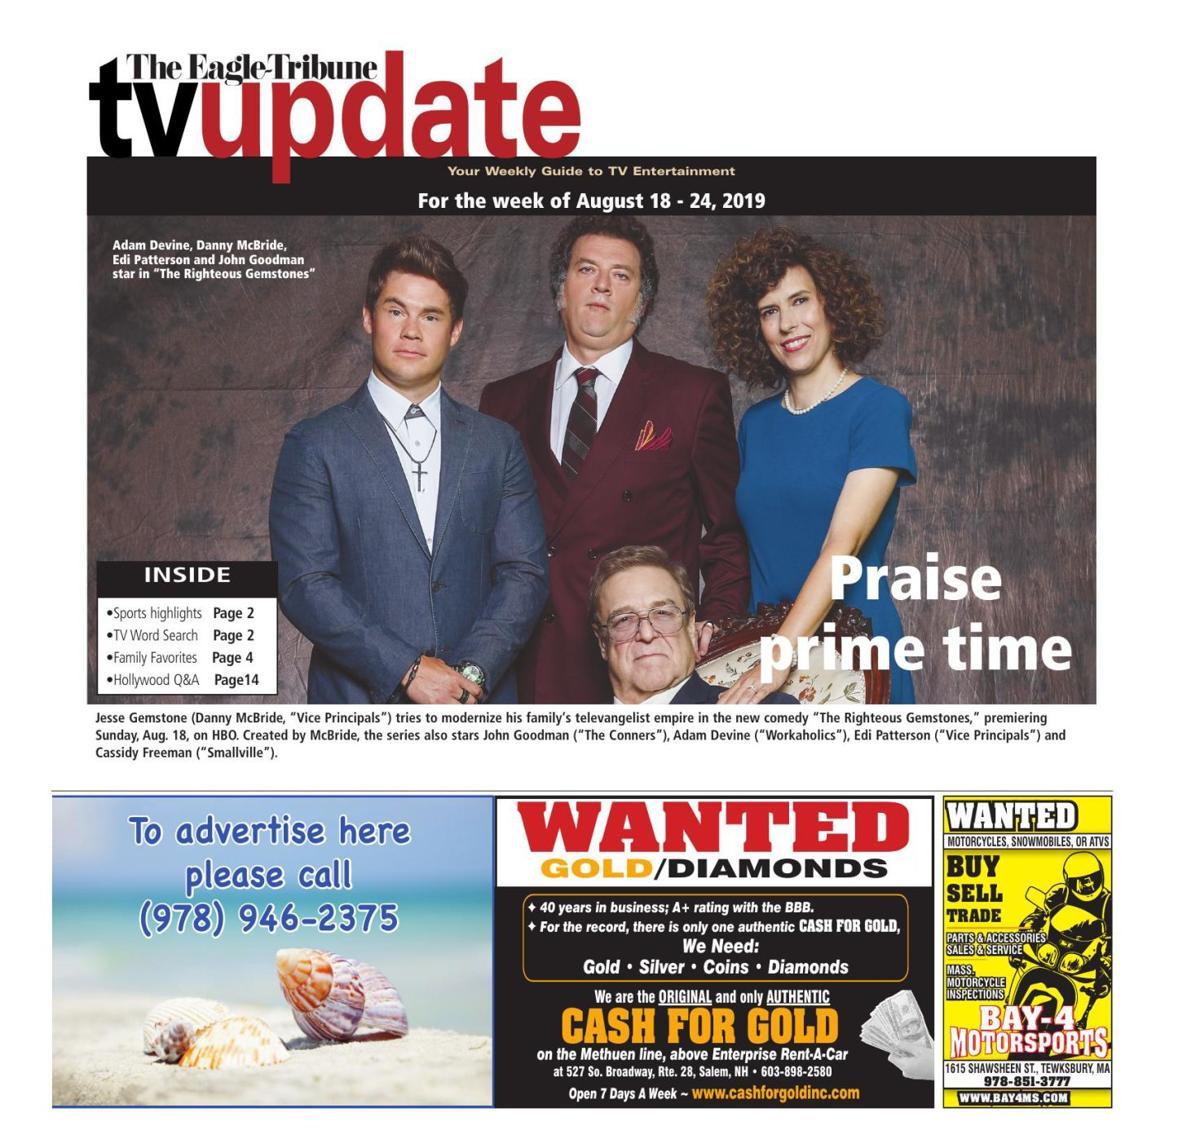 TV update: Aug. 18-24